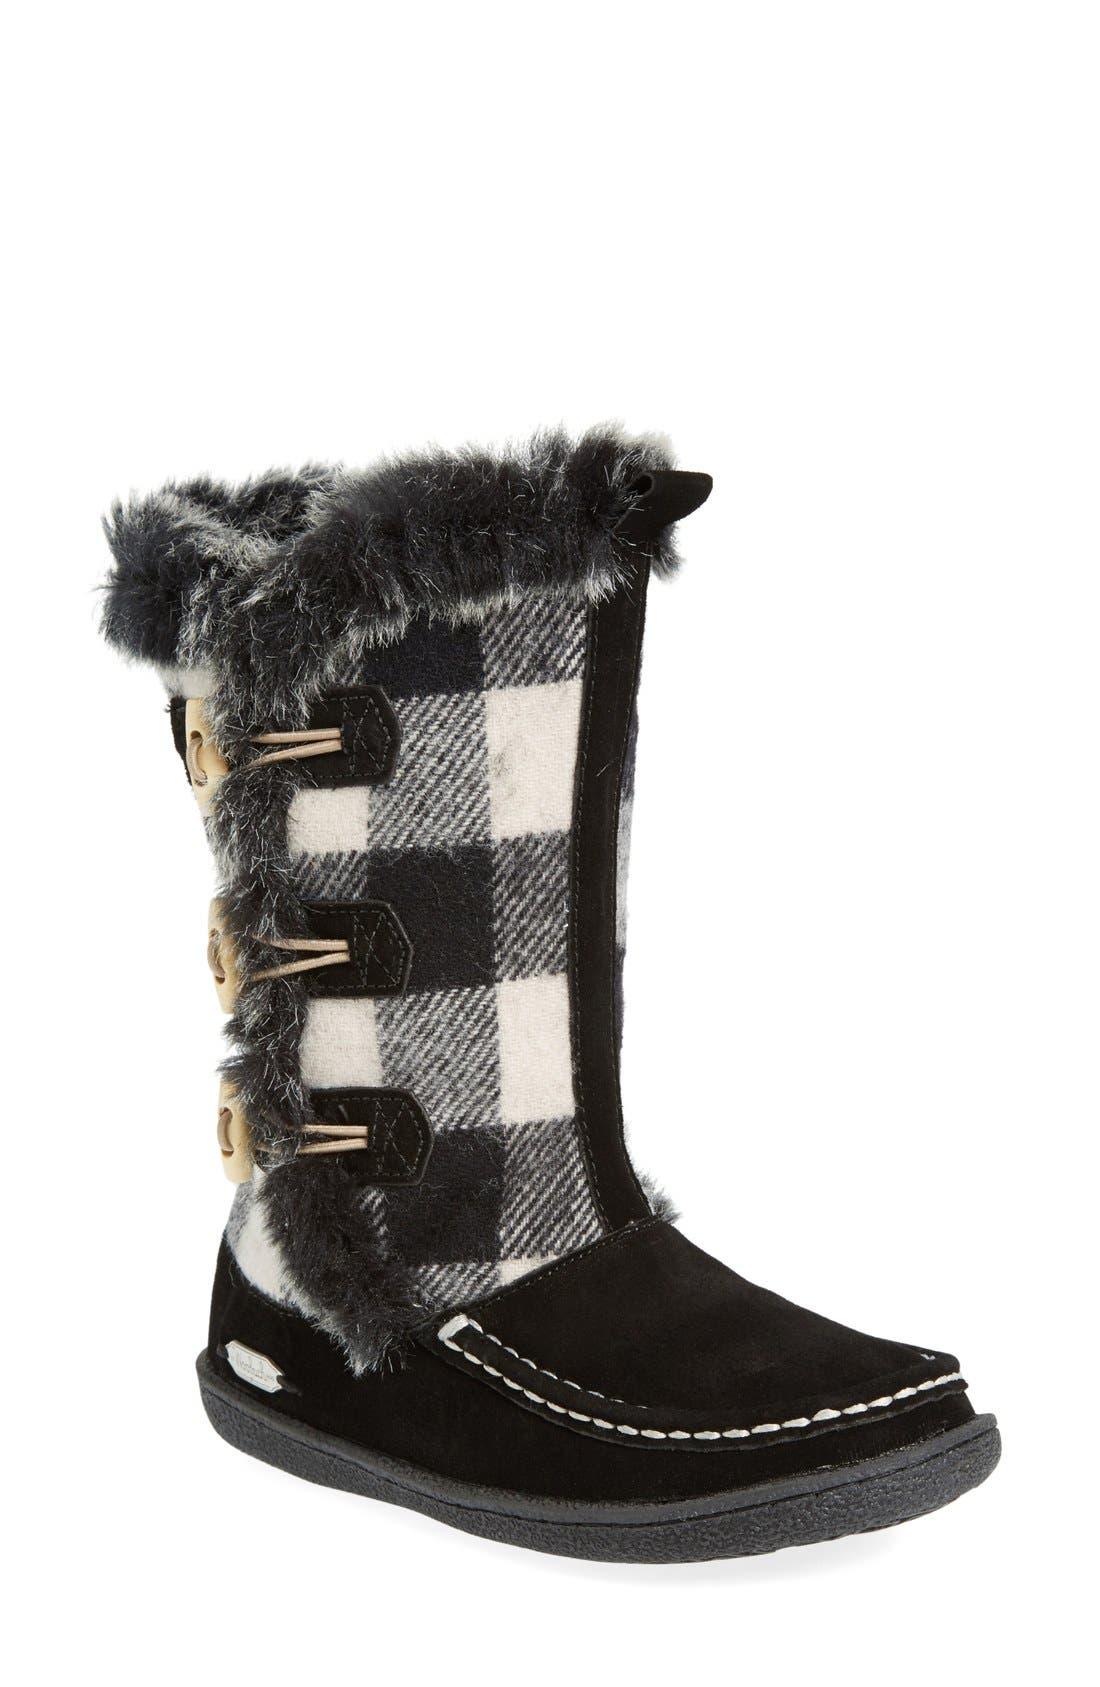 'Elk Creek' Boot,                             Main thumbnail 1, color,                             Black/ Buffalo Wool